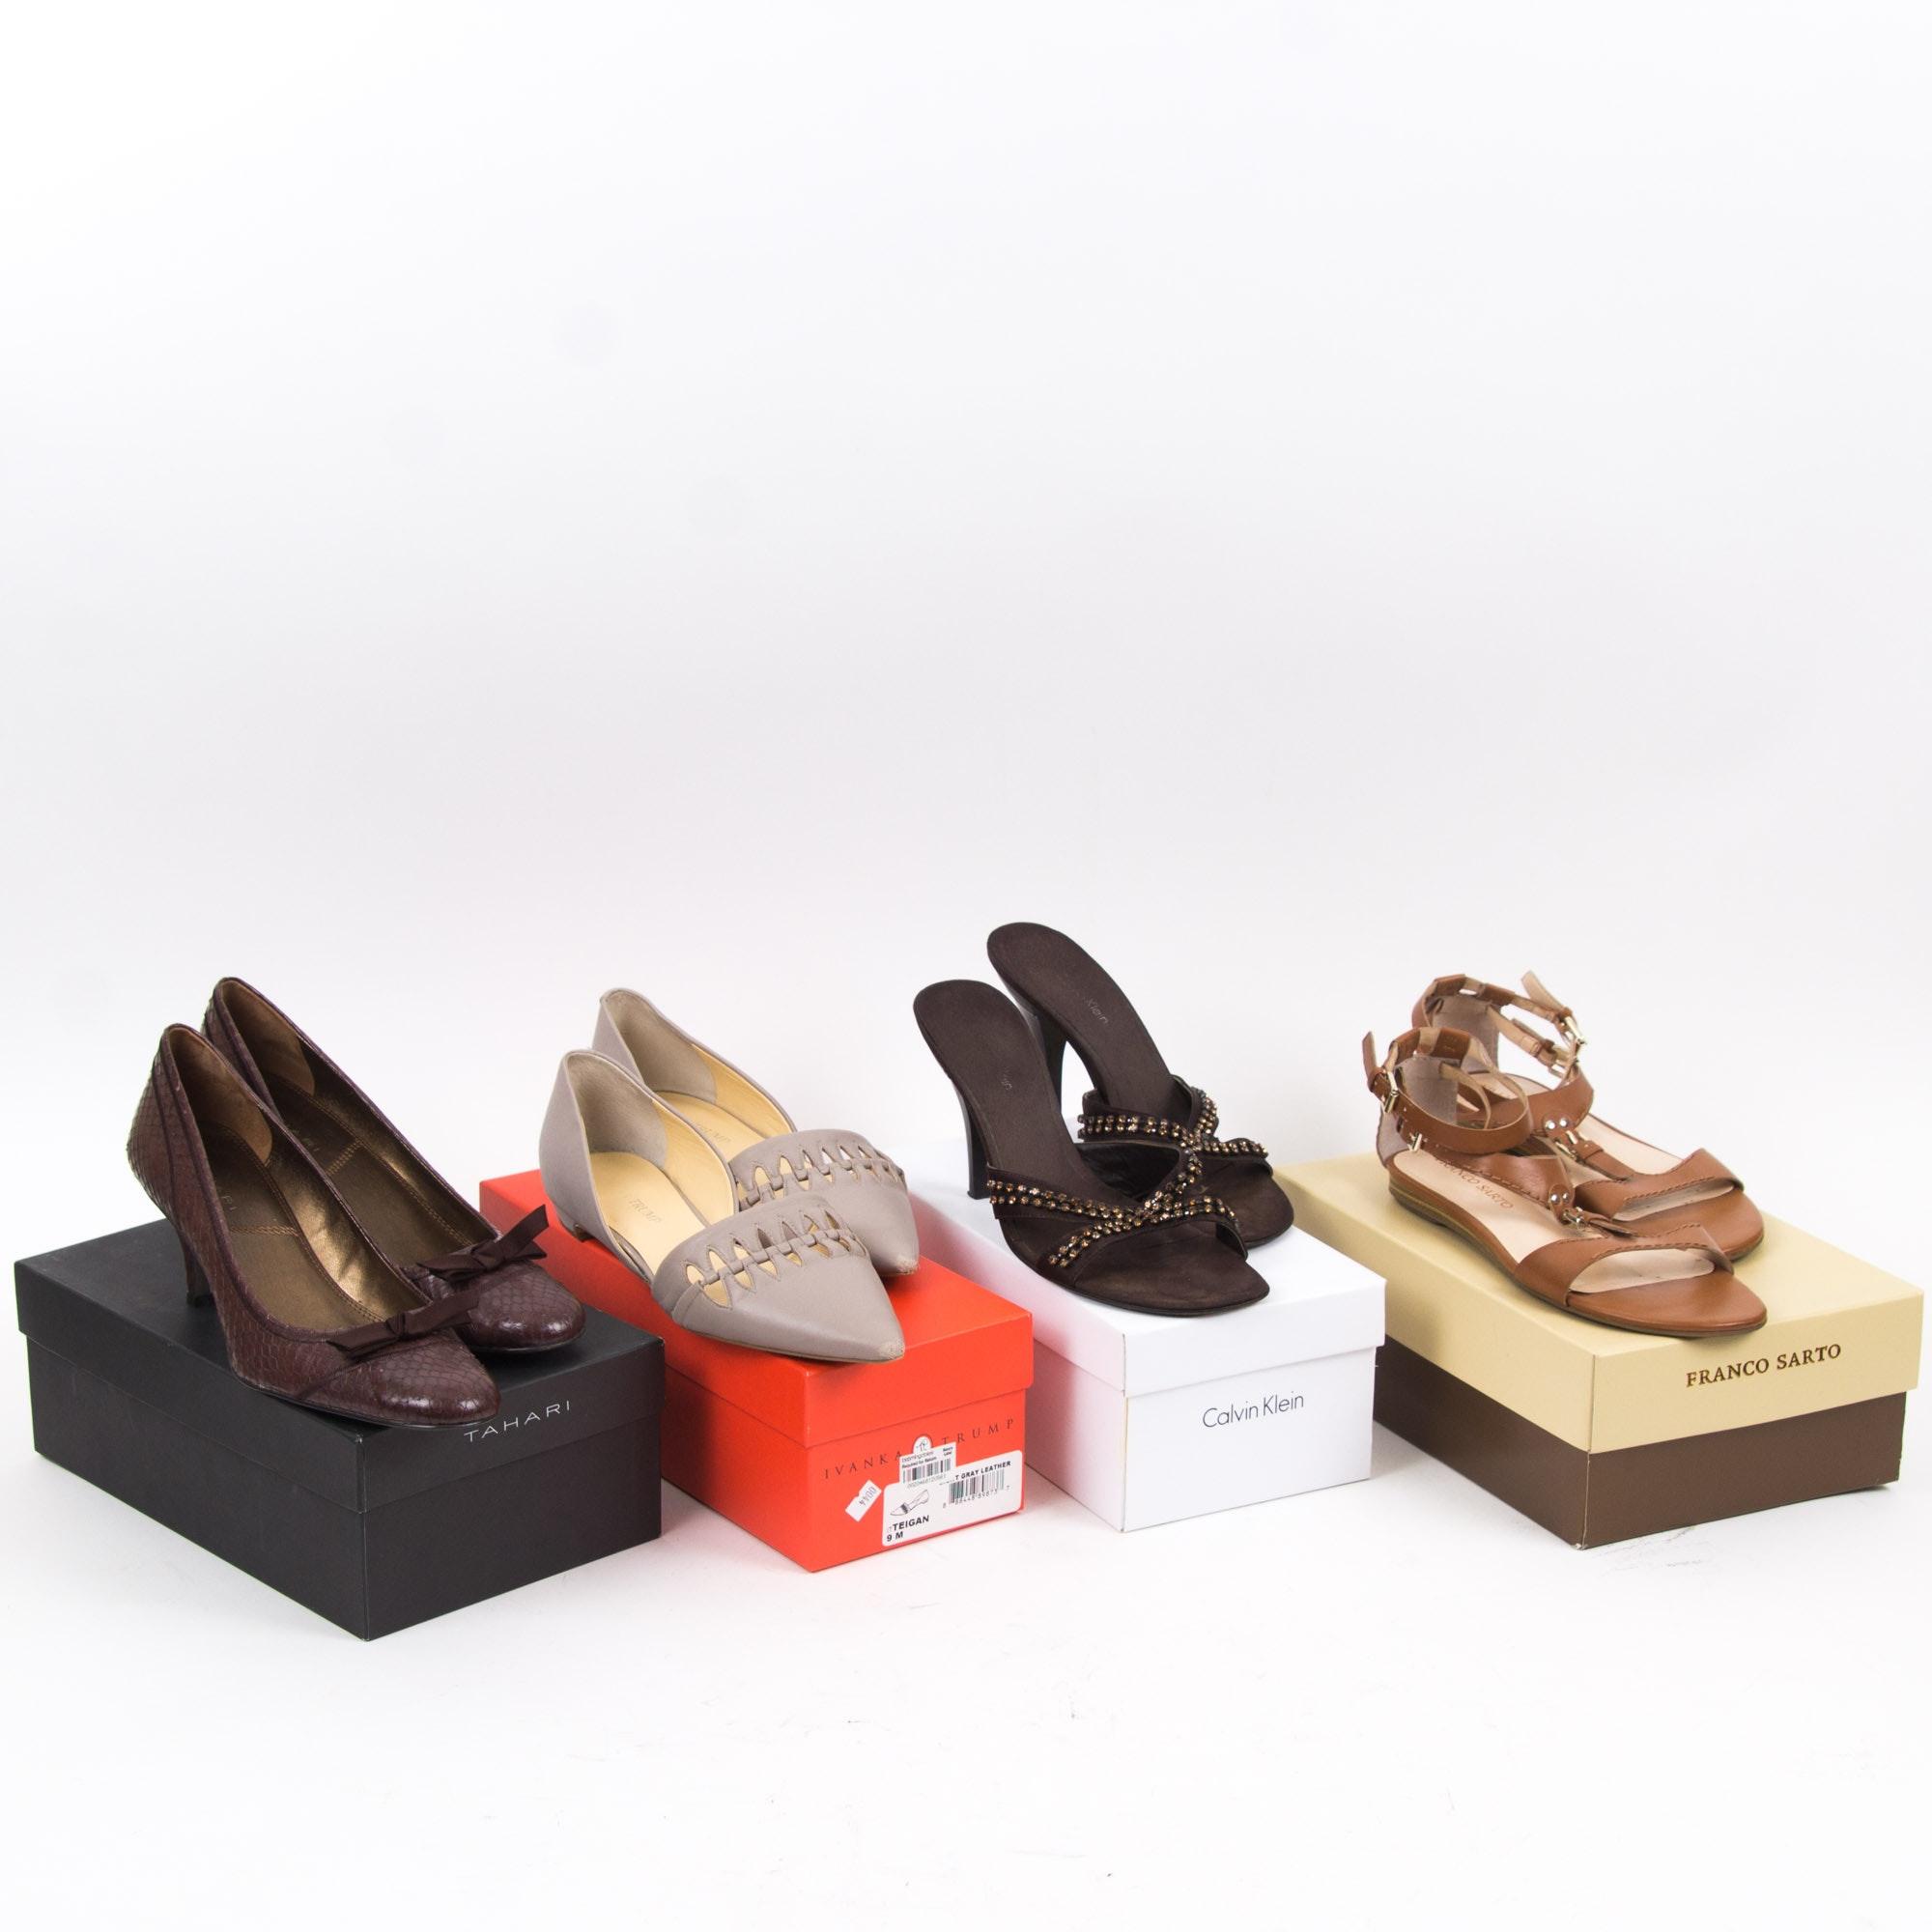 Women's Designer Shoes Including Calvin Klein, Franco Sarto, and Tahari